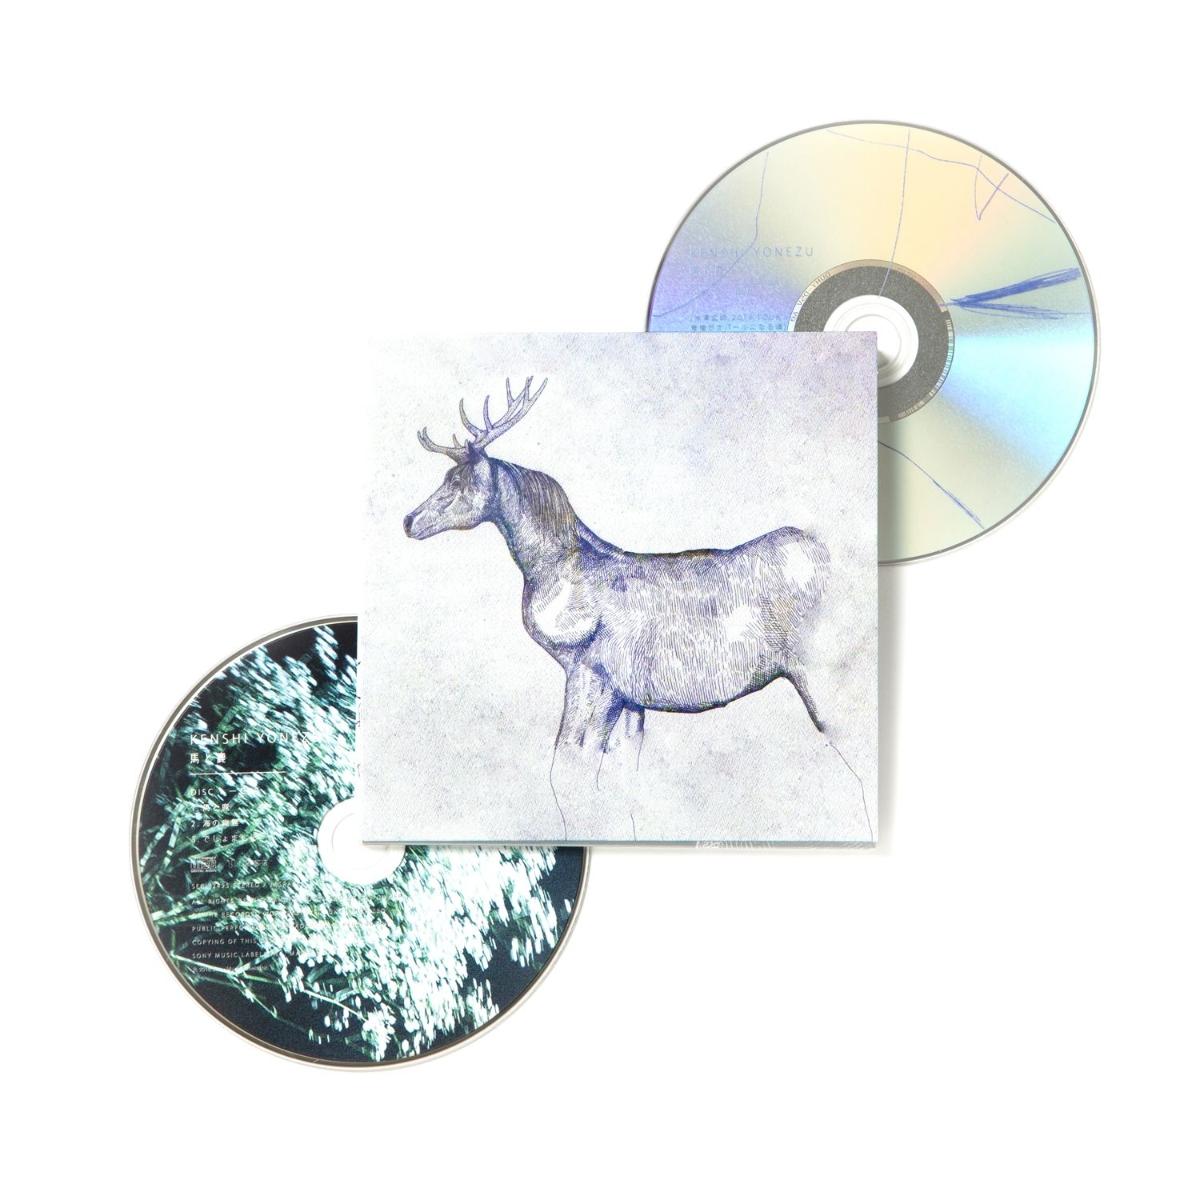 楽天ブックス: 馬と鹿 (初回限定盤 CD+DVD) (映像盤) - 米津玄師 ...